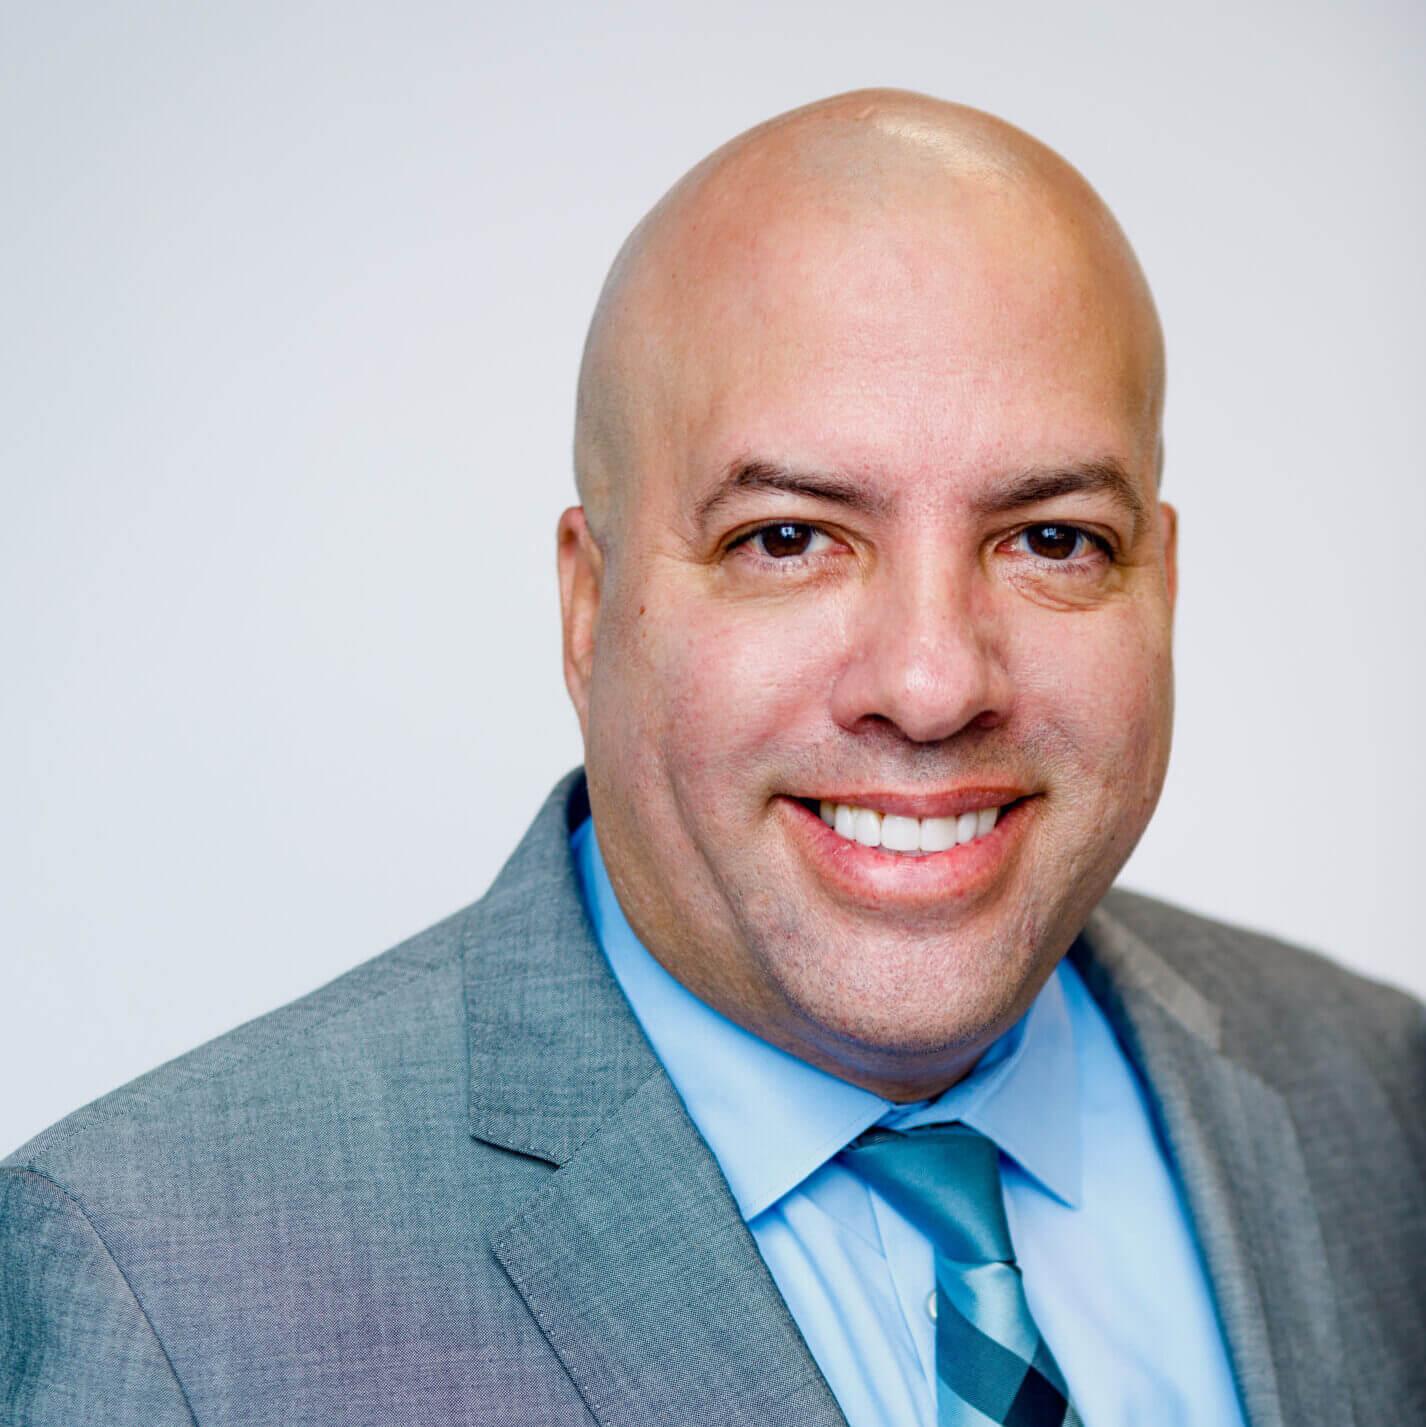 Justice HQ member testimonial, Carlos Martinez LTI Law, A.P.C.